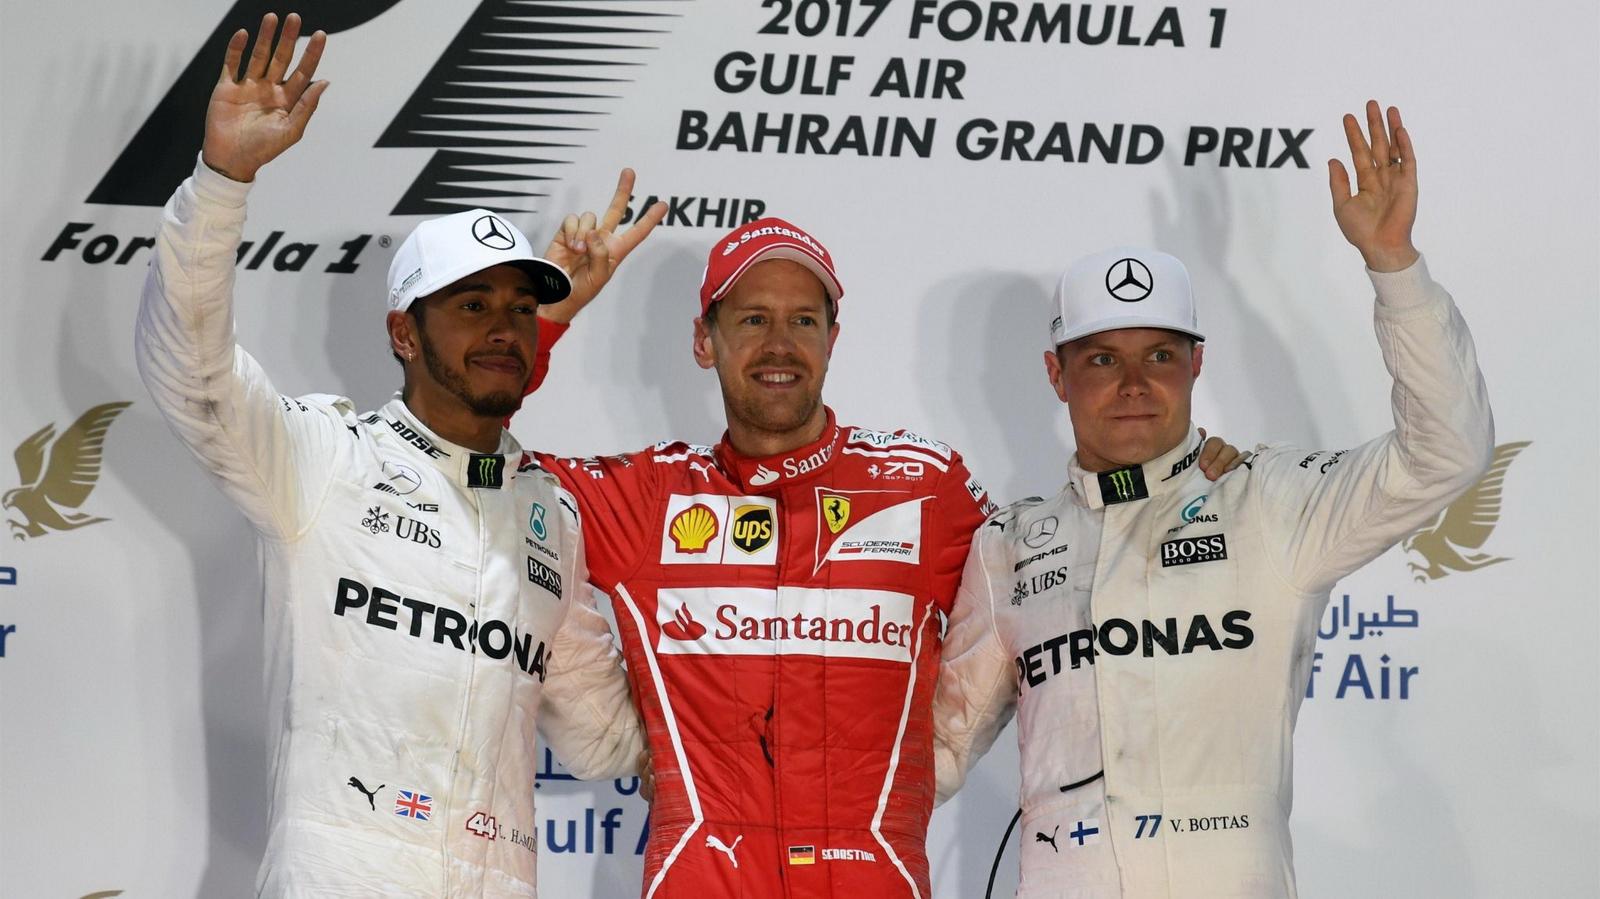 2017_bahrain_gp_race_day_182.jpg